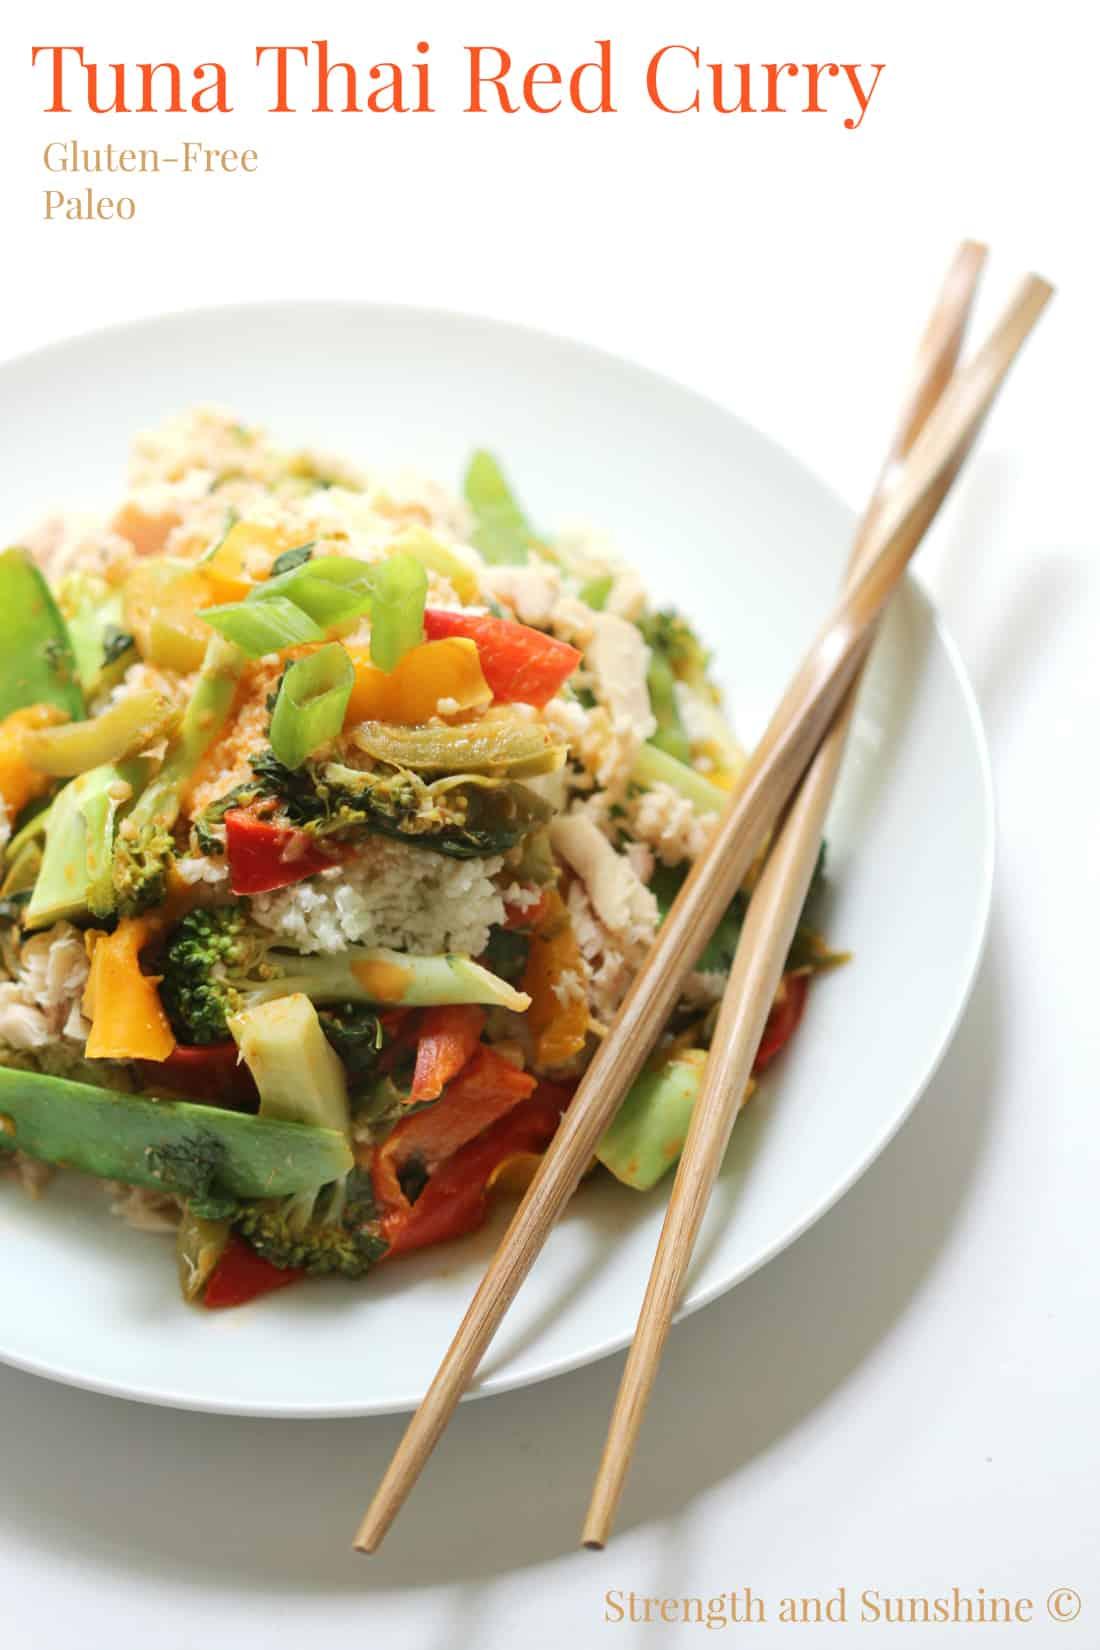 Tuna-Thai-Red-Curry-PM